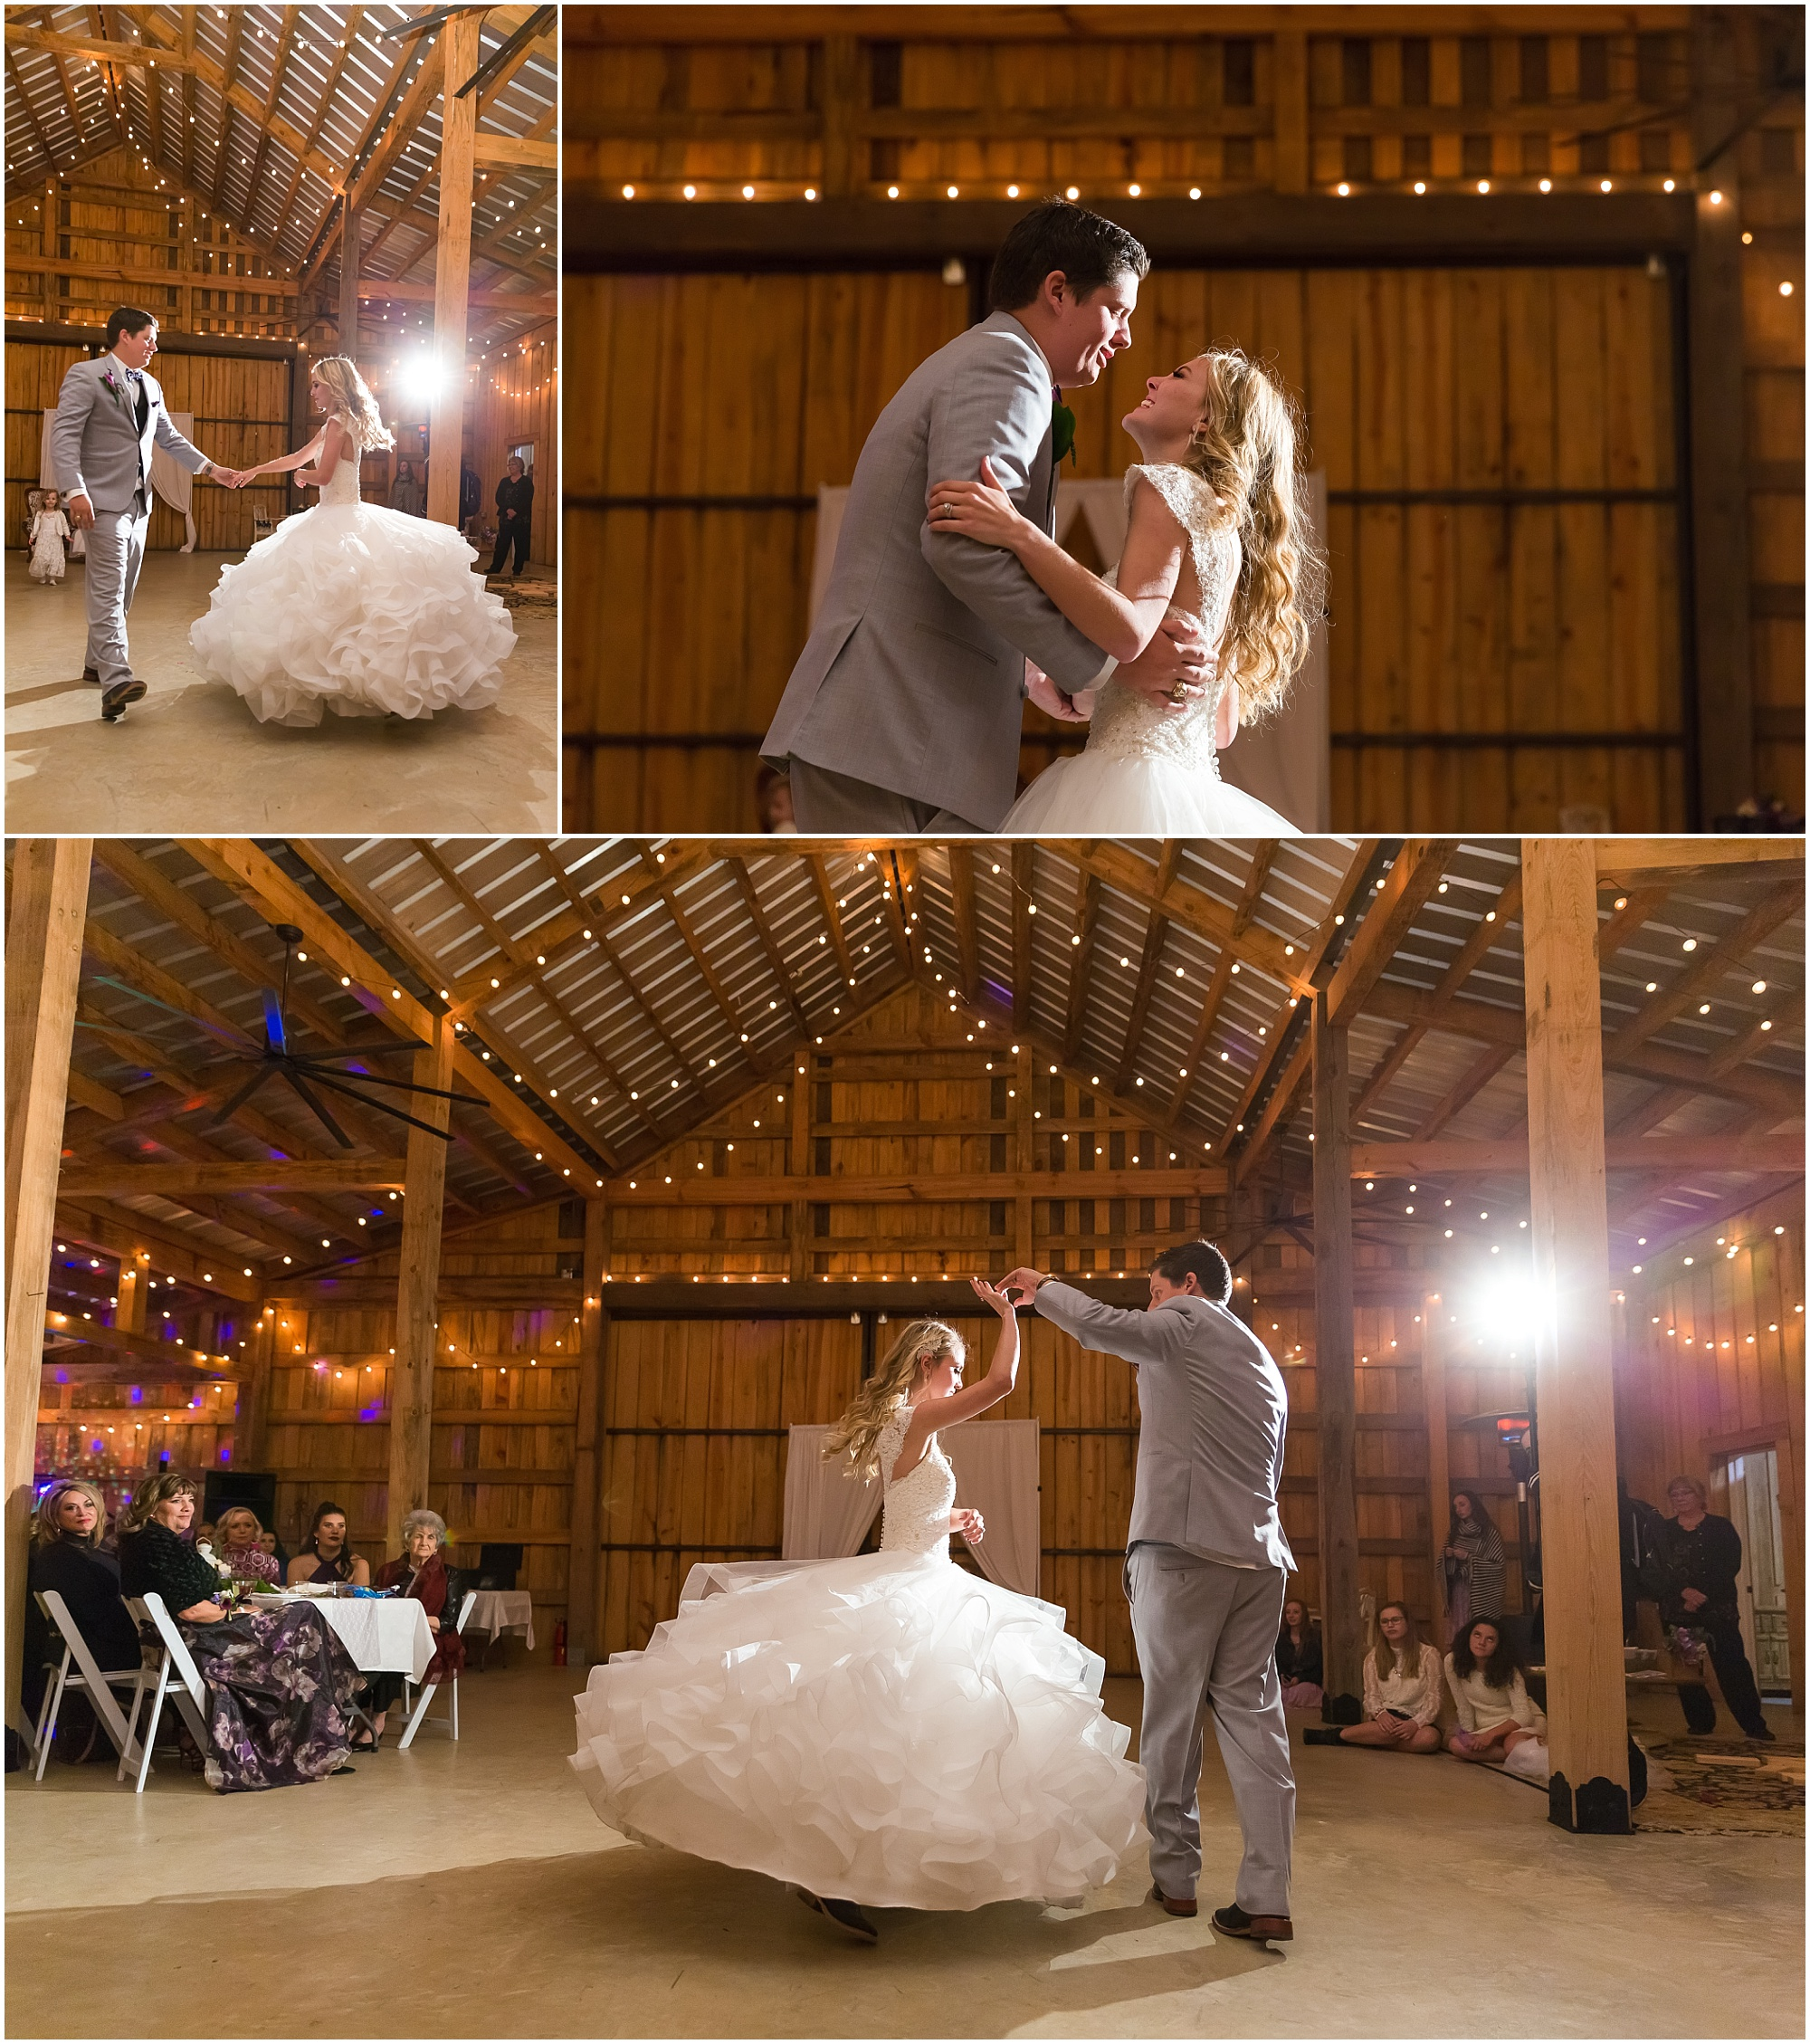 Disney-Inspired-Wedding-Central-Texas_0057.jpg